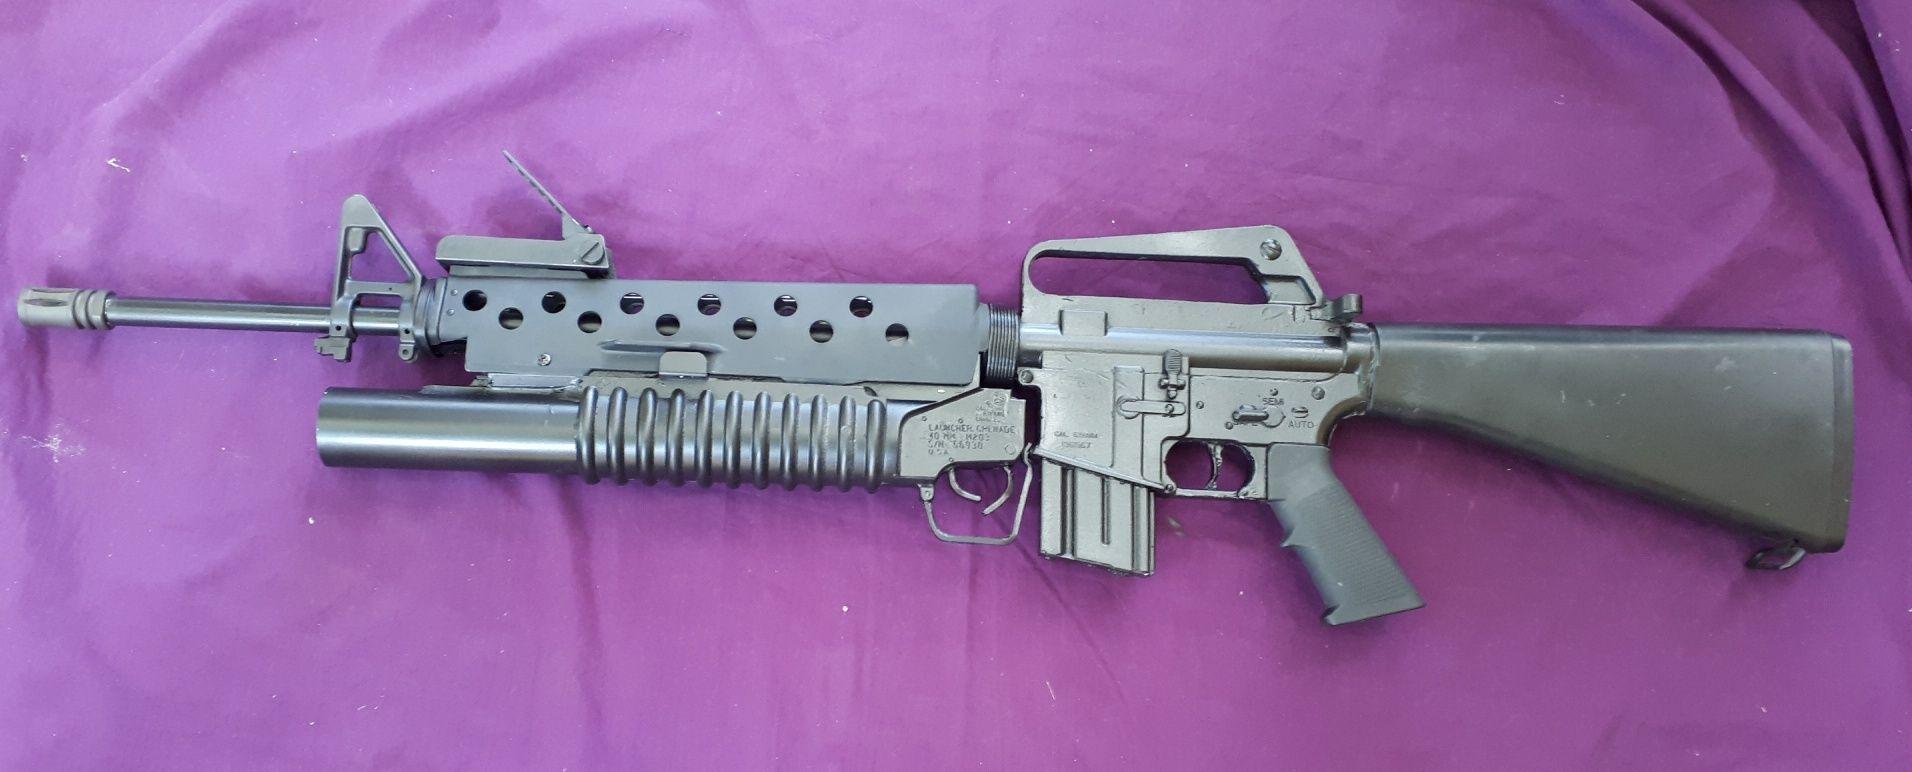 Replica Gun, Replica Guns Australia, Replica Grenades